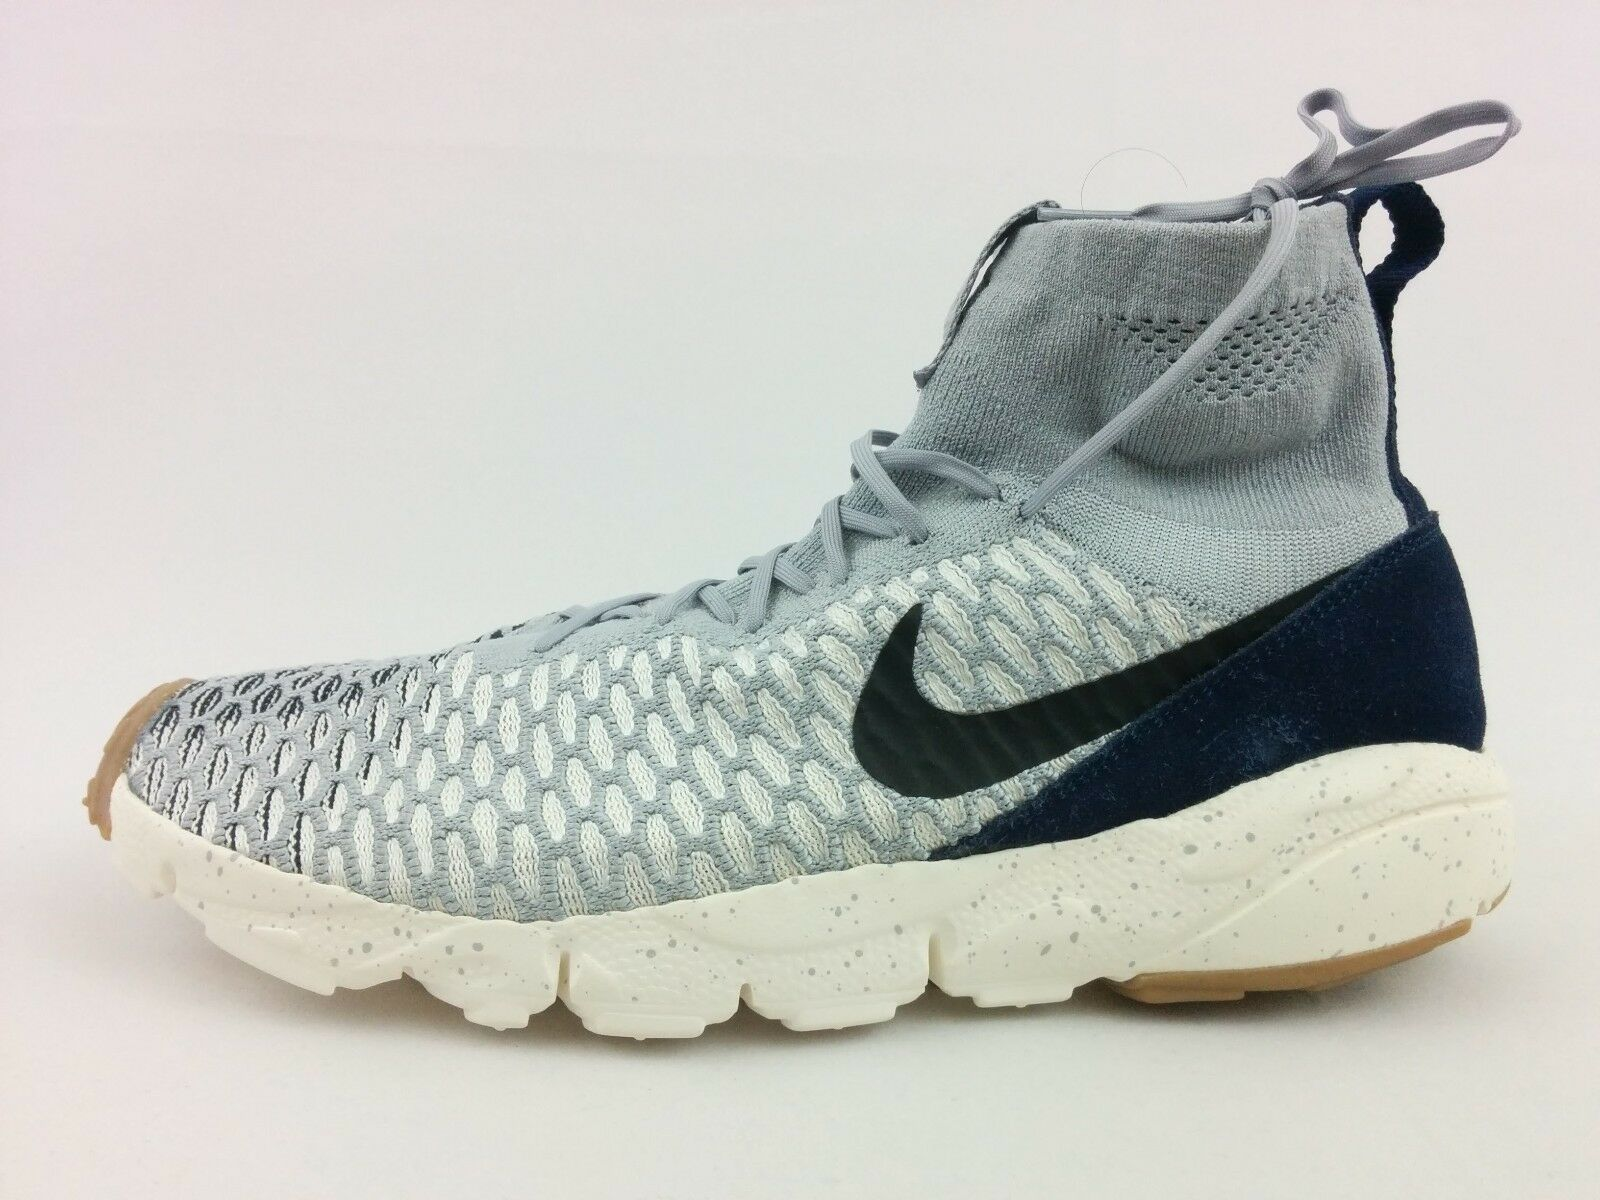 Nike Footscape Magista Flyknit SIZE 11.5 Wolf Grey Obsidian Sail 816560-001